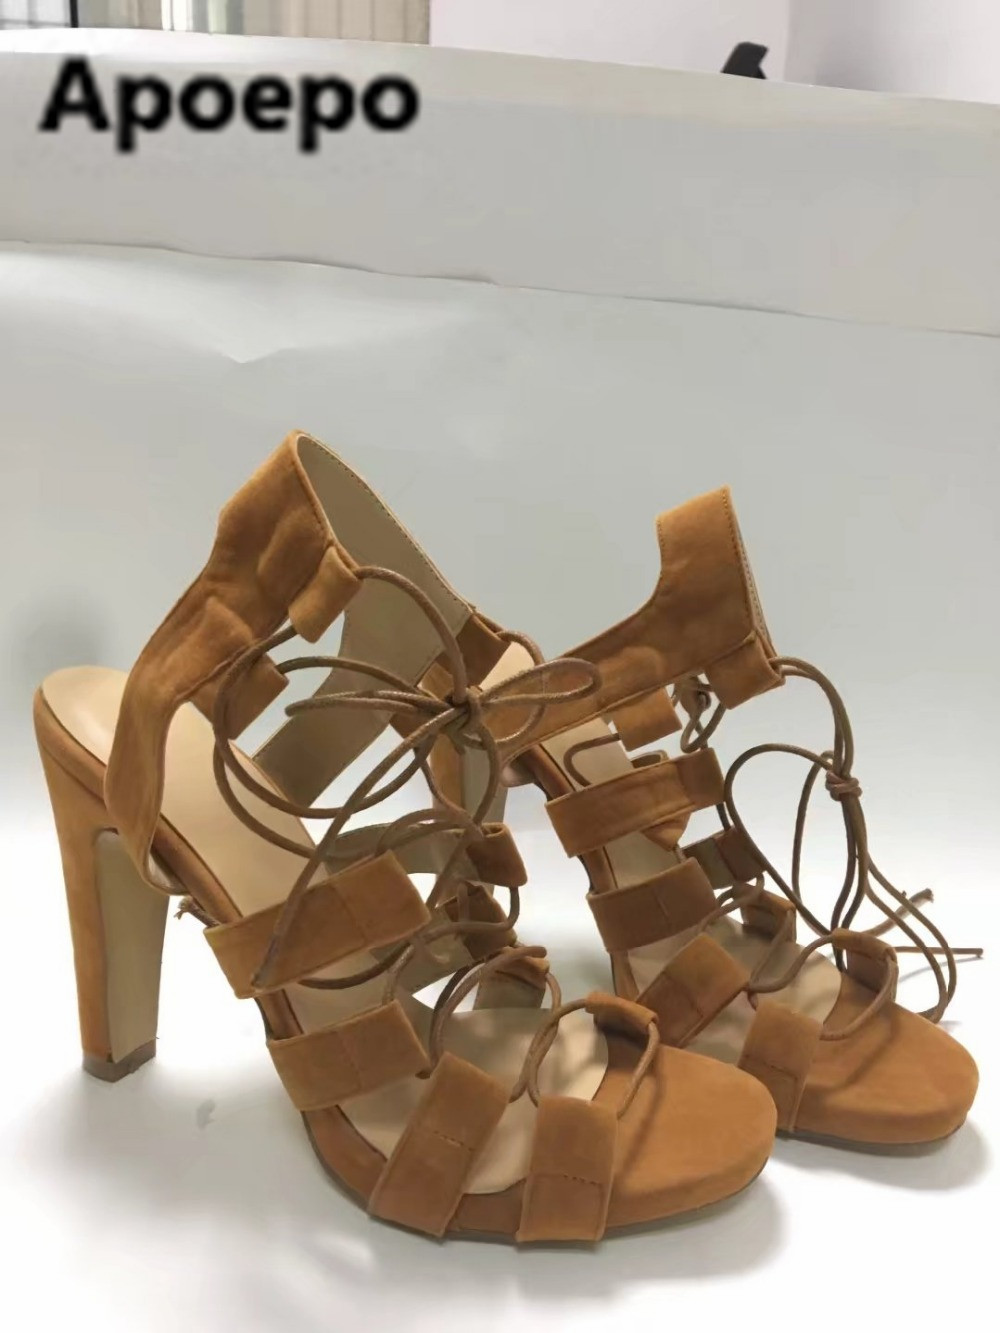 Apoepo brand New arrival khaki lace up high heels sandals women platform sexy shoes cross tied sandali eleganti donna size 42 штаны прямые billabong new order chino khaki